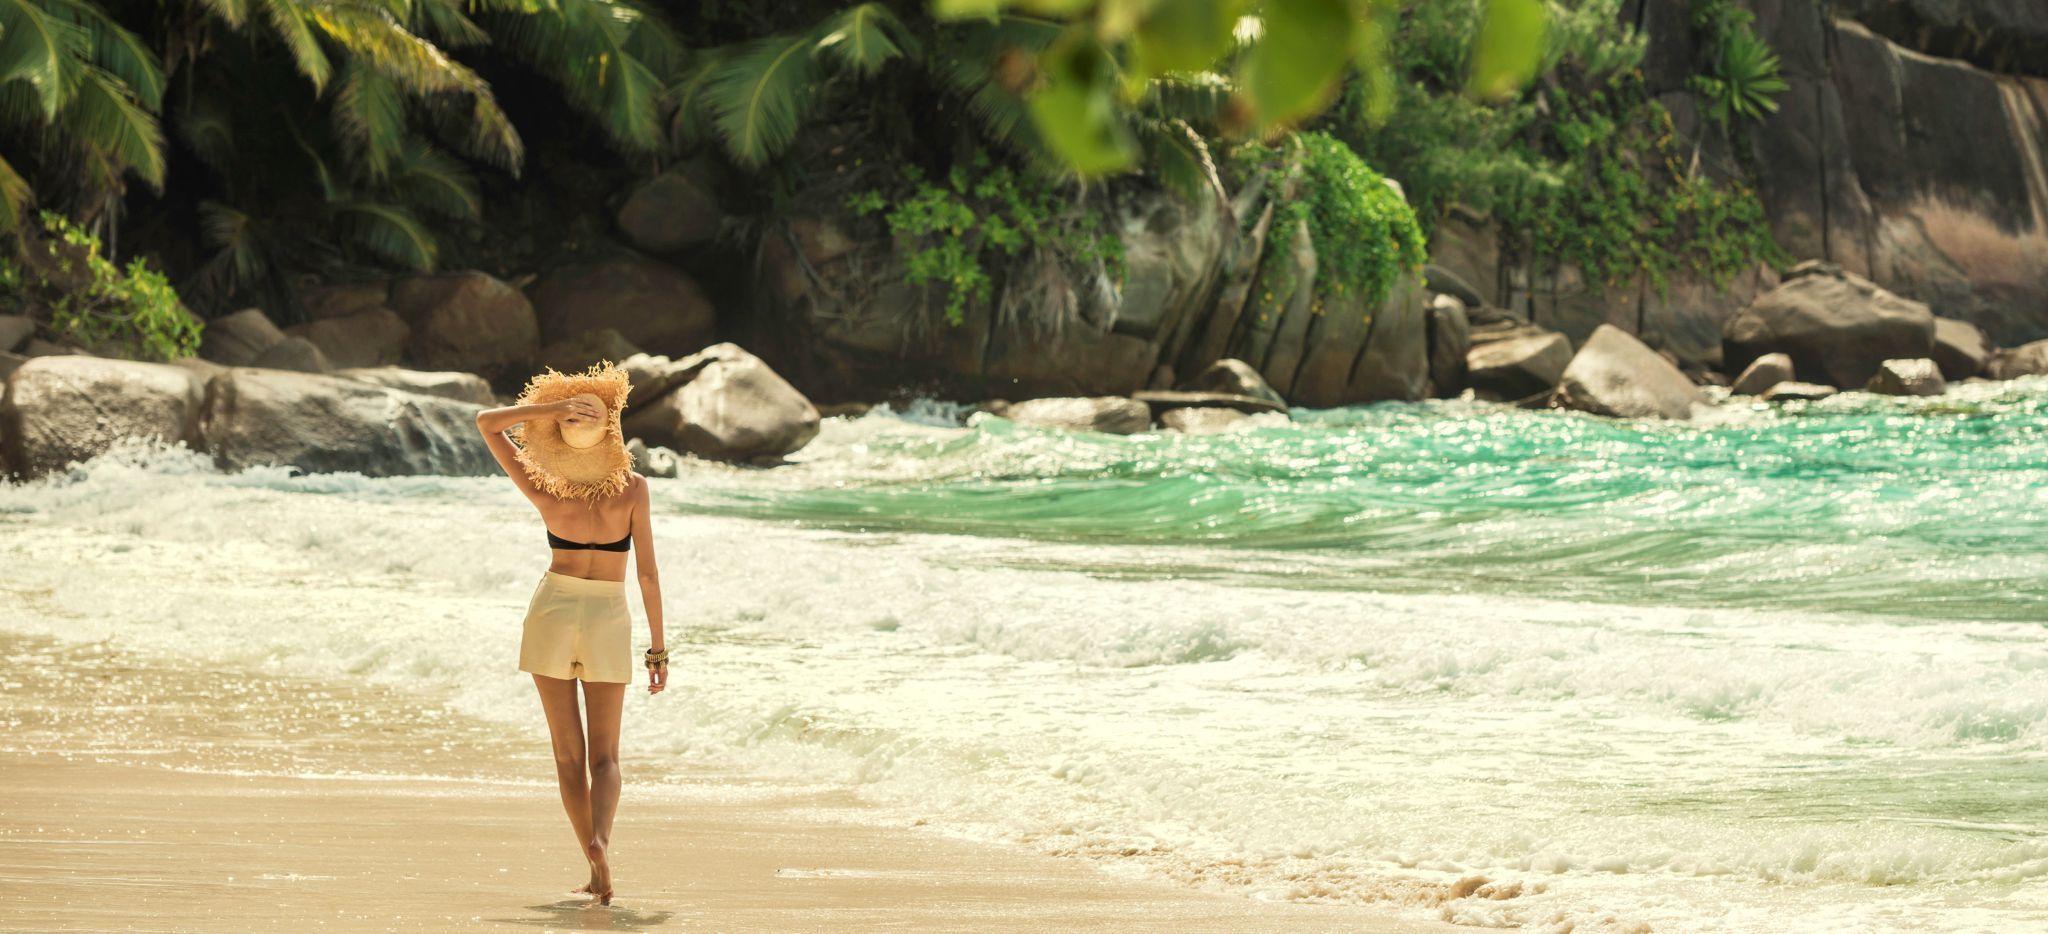 Schöne Frau mit Sonnenhut wandert den Strand Petit Anse vor dem Hotel Four Seasons Resort Seychelles entlang